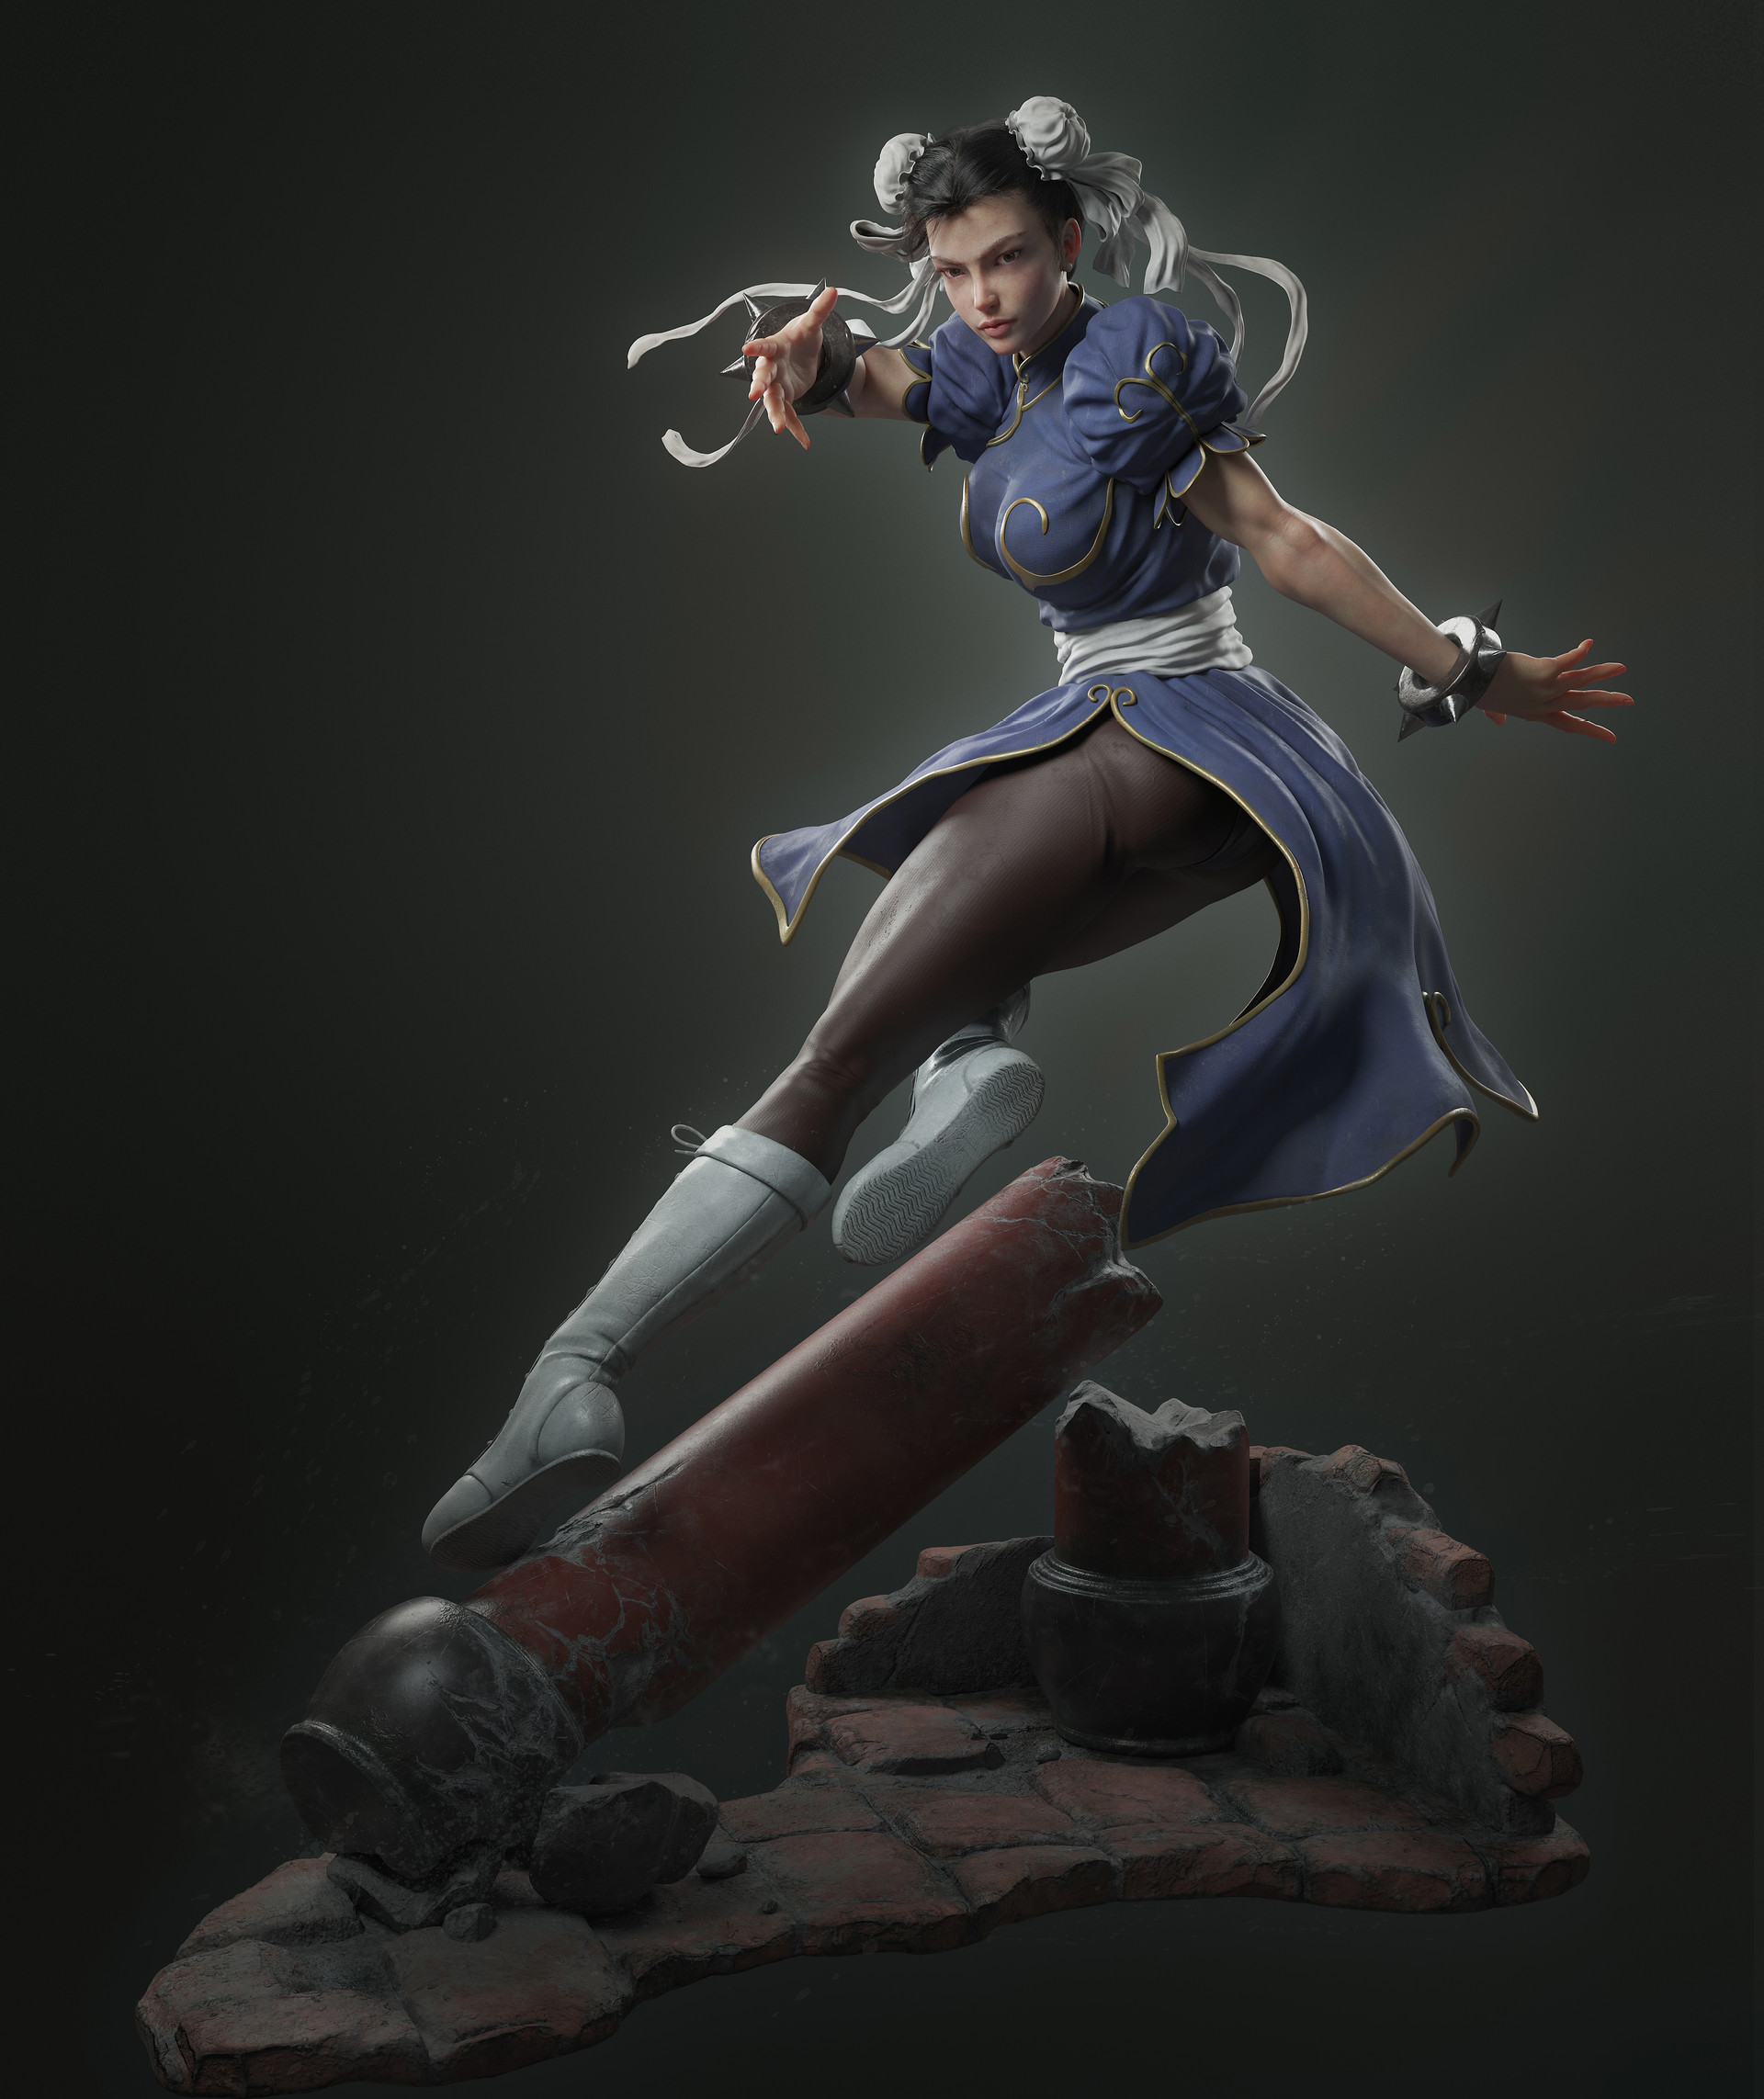 Chun Li, Street Fighter, игры, 3d art, арт, 翼次方 Studio, игровой арт